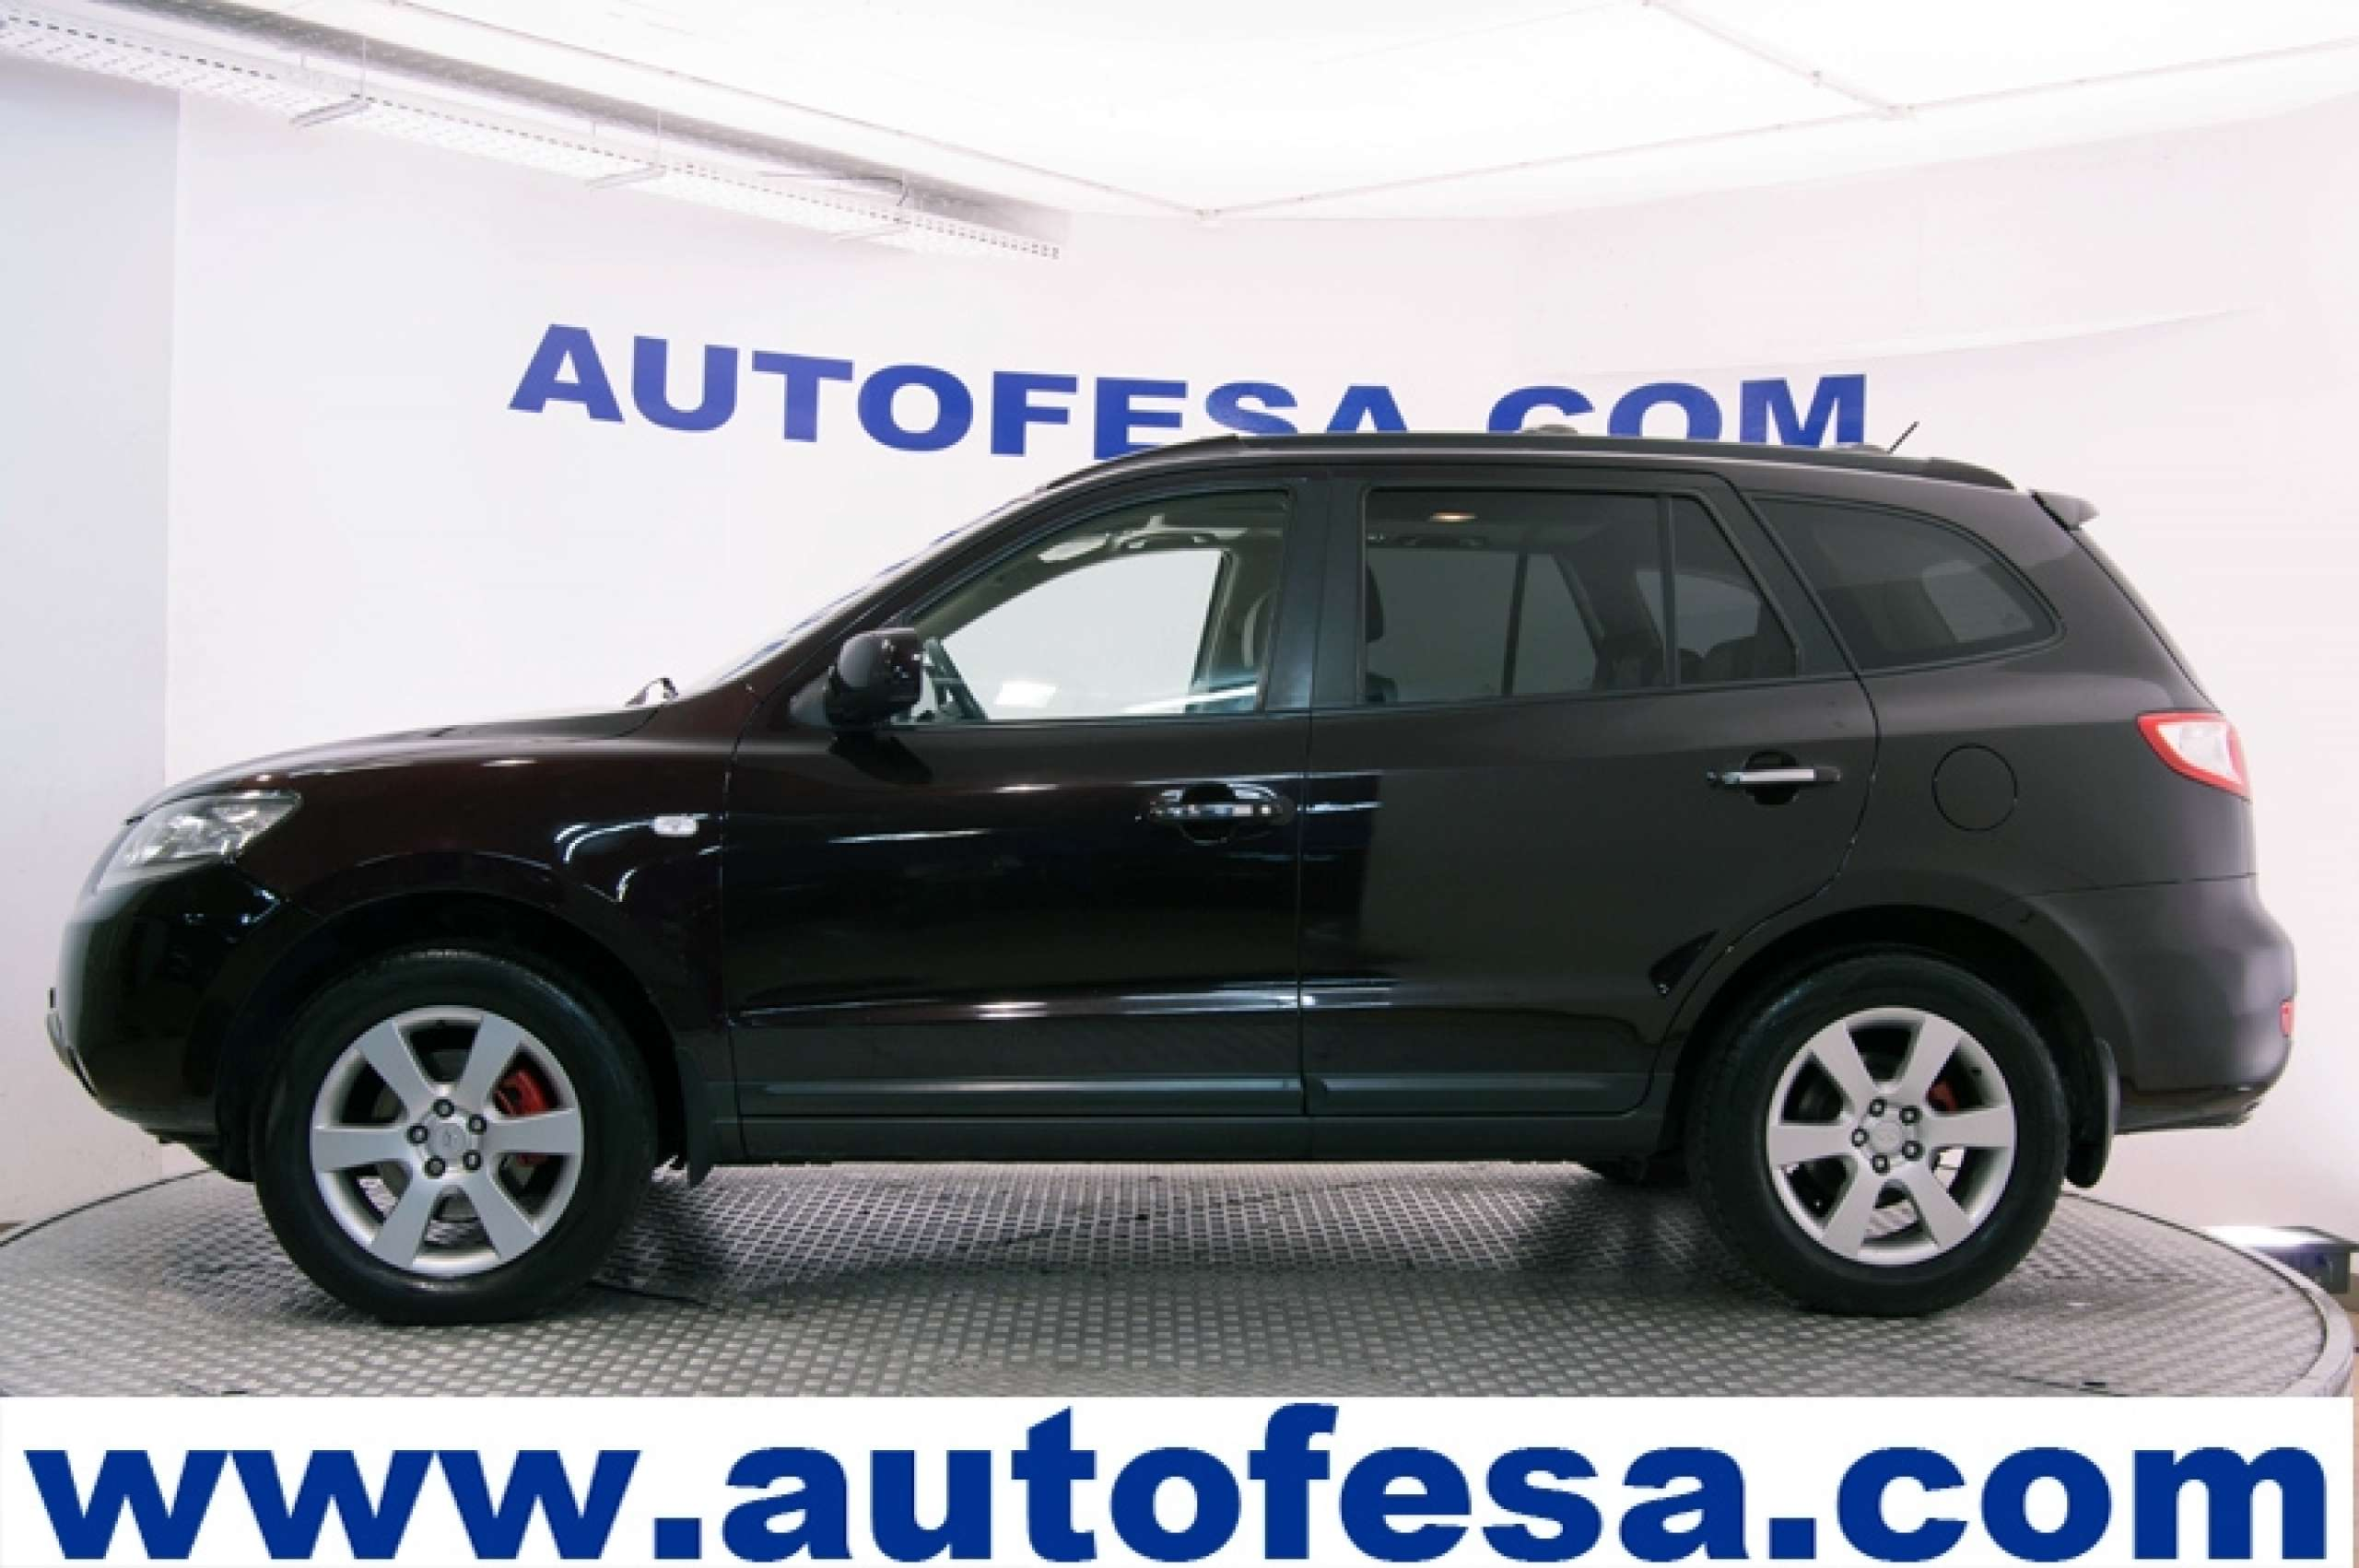 Hyundai Santa Fe 2.2 CRDI 155cv Style Auto 5p - Foto 5